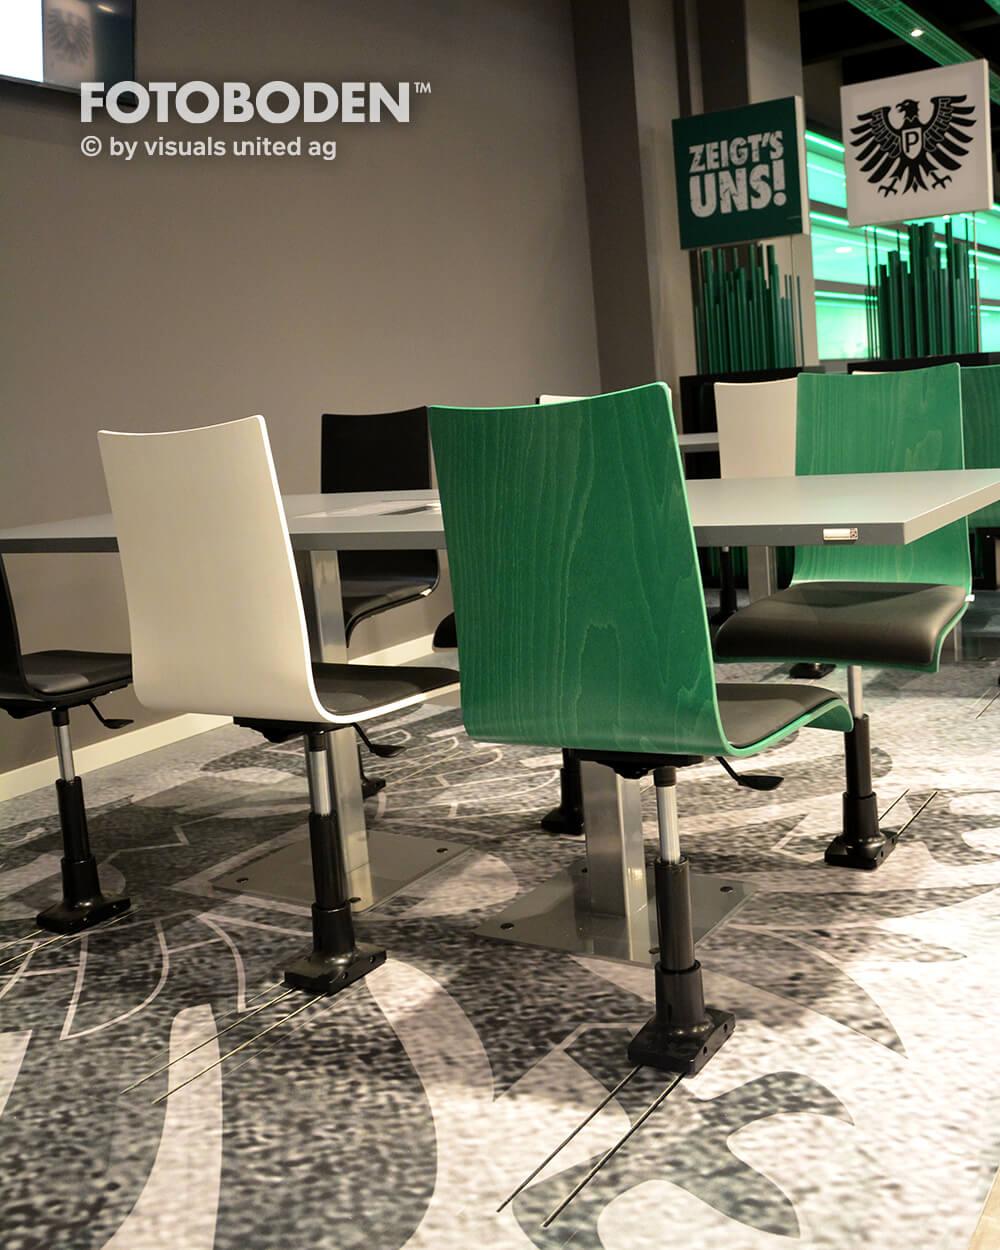 Preußen Münster Fotoboden Sport Sponsoring Werbung Advertising Flooring 5